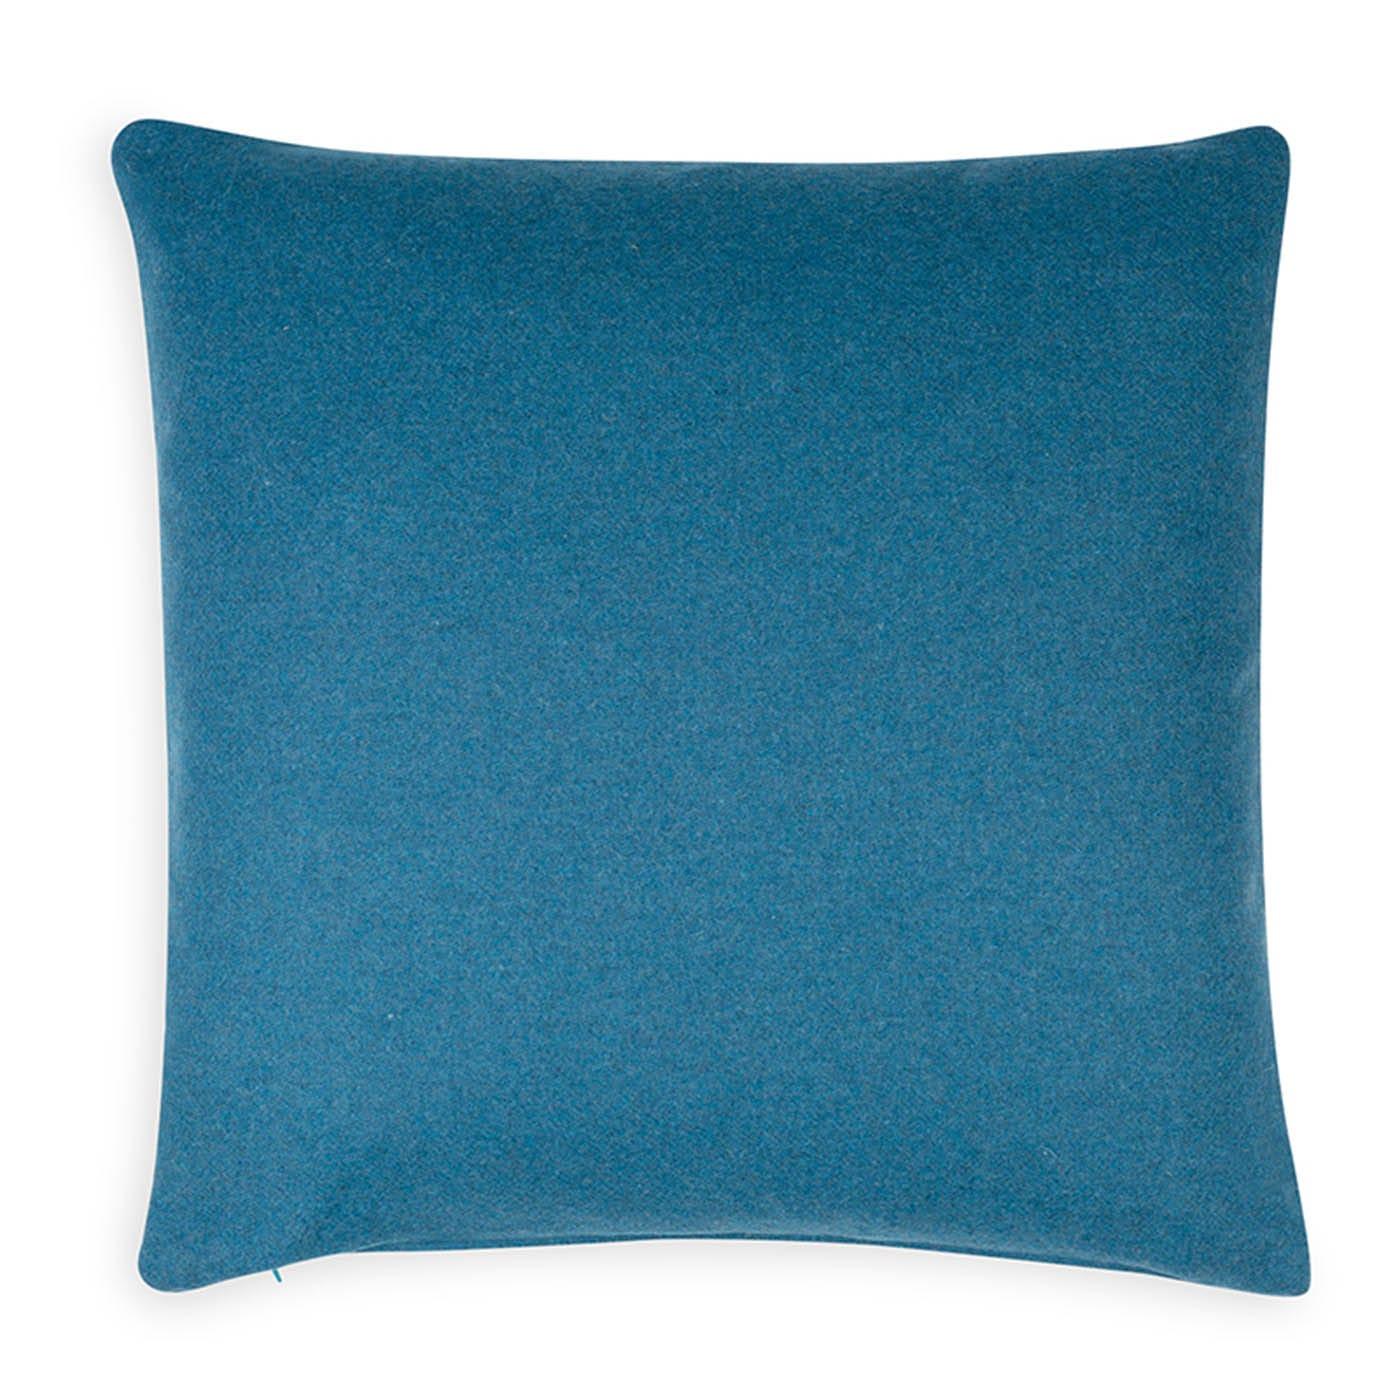 Islington Wool Cushion Cyan 45 x 45cm